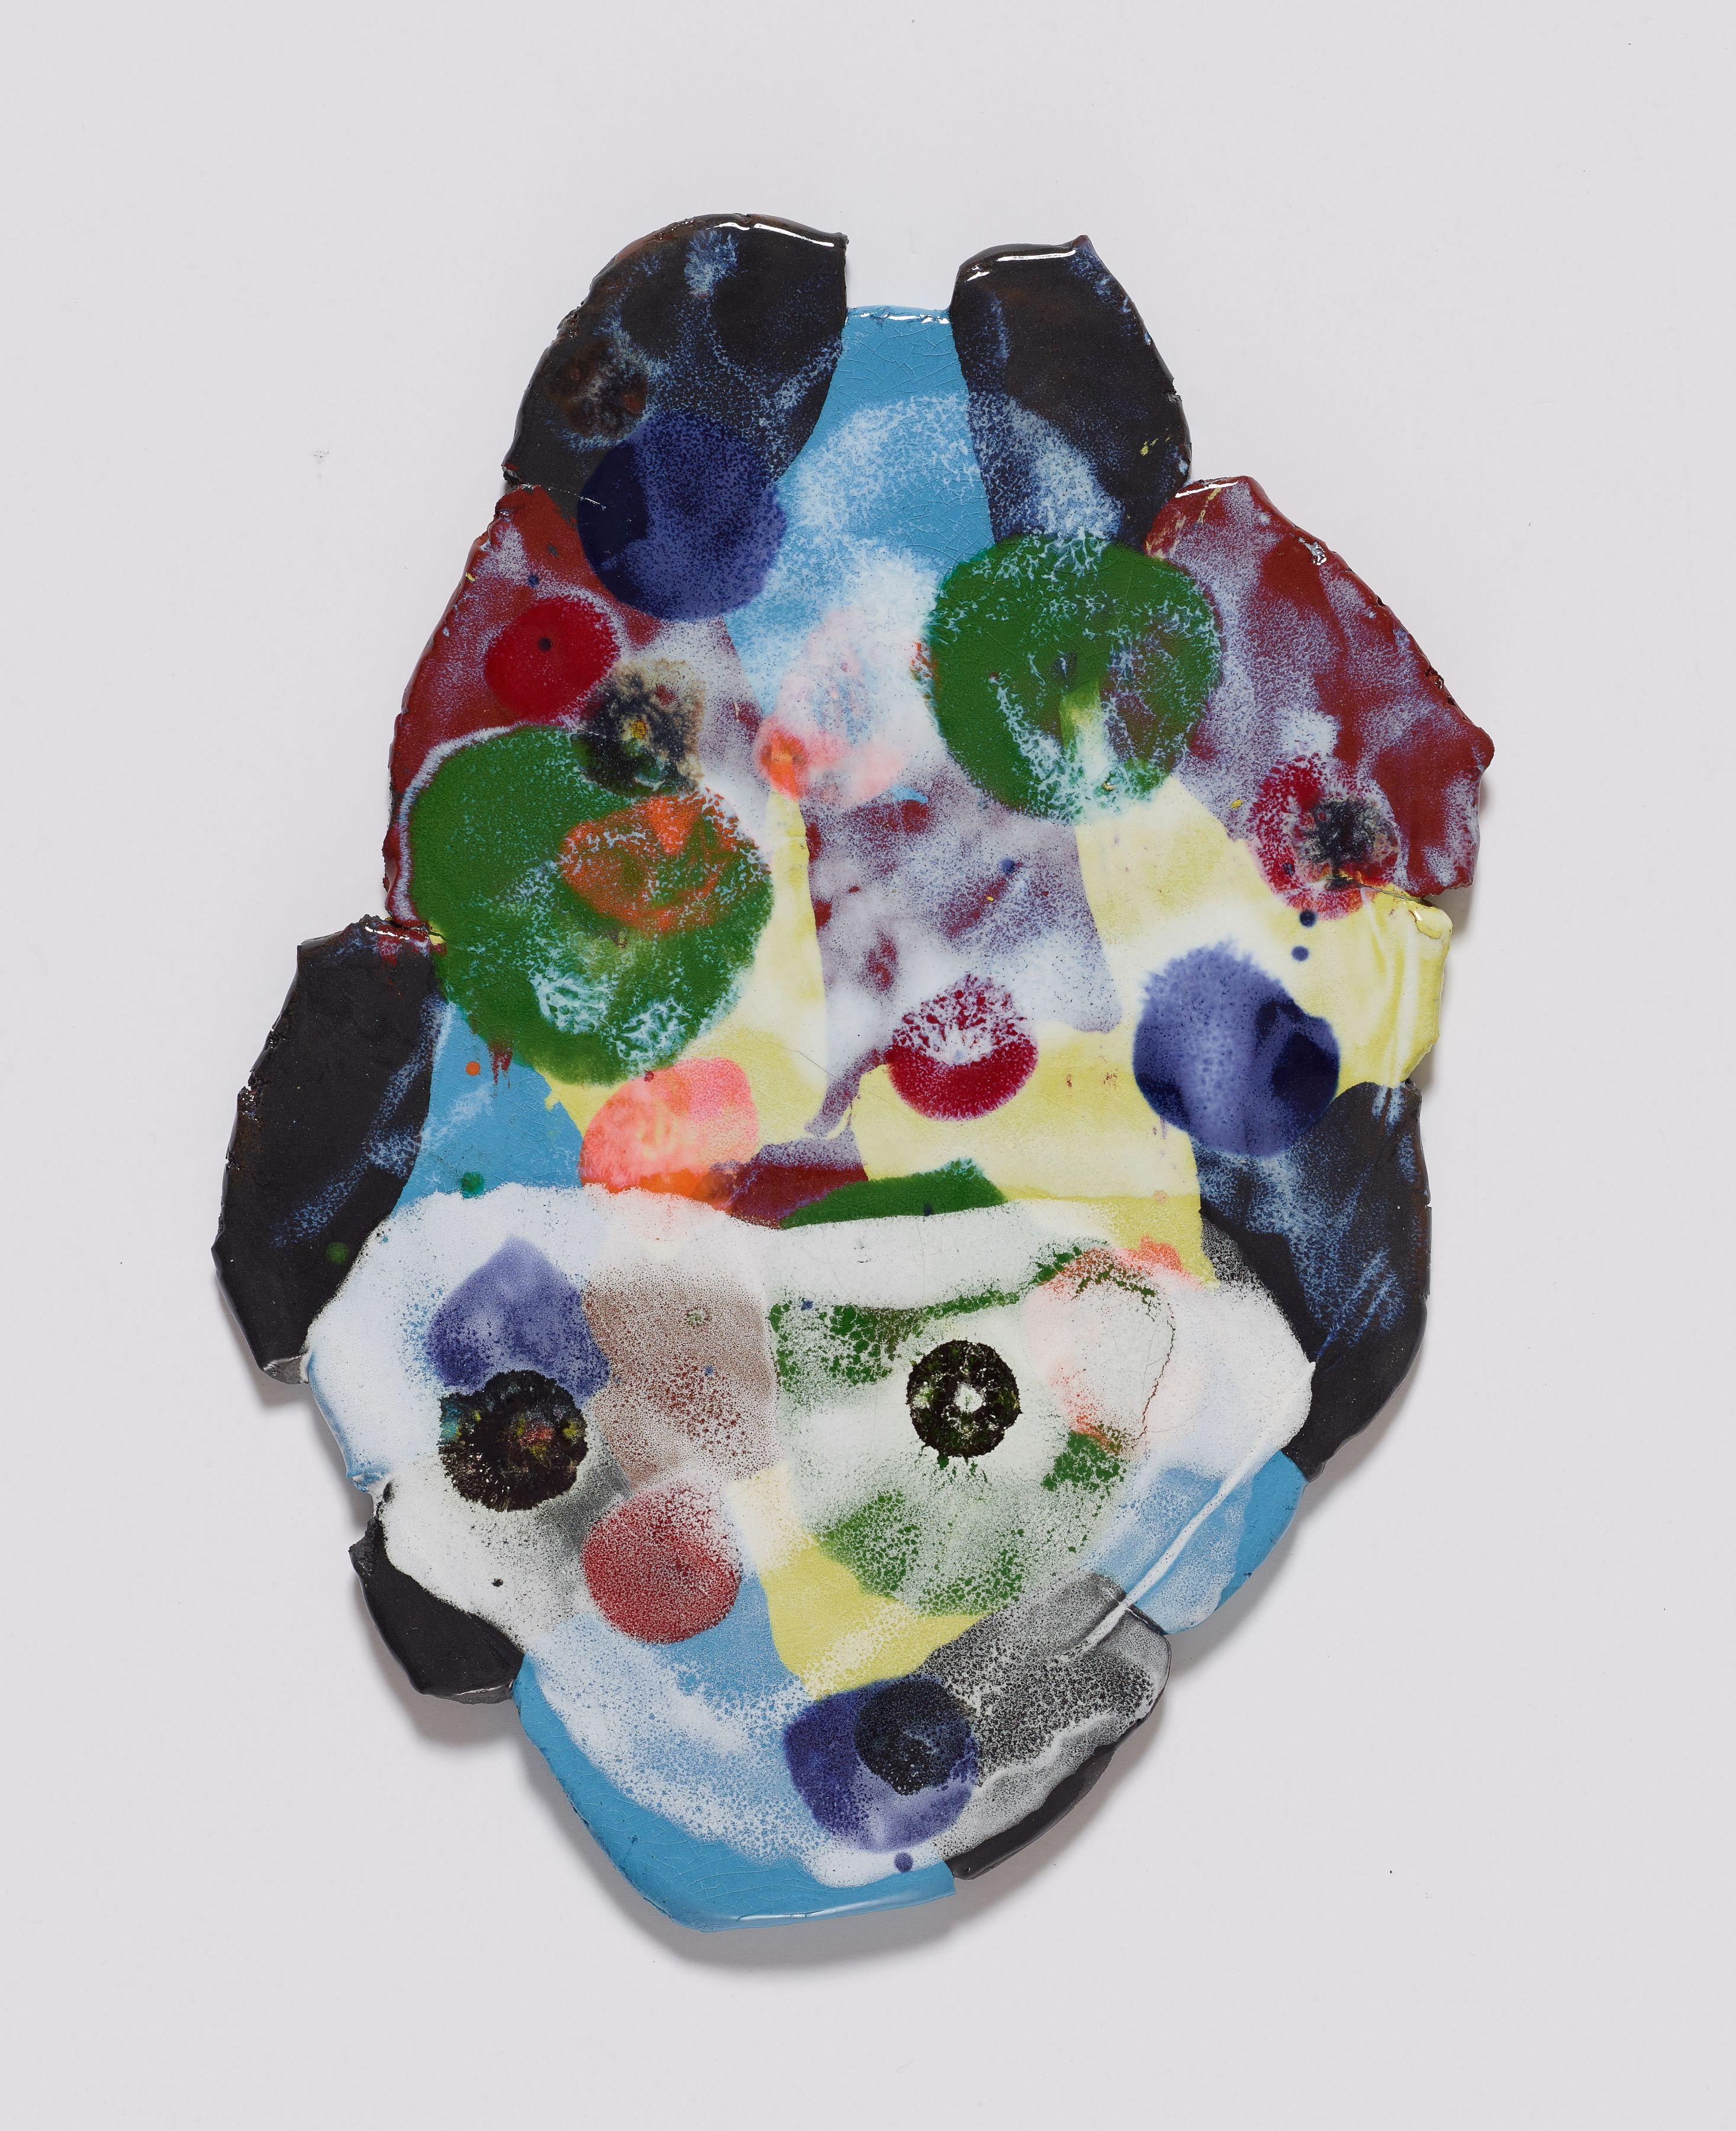 Luiz, 2016, Colored porcelain and glaze